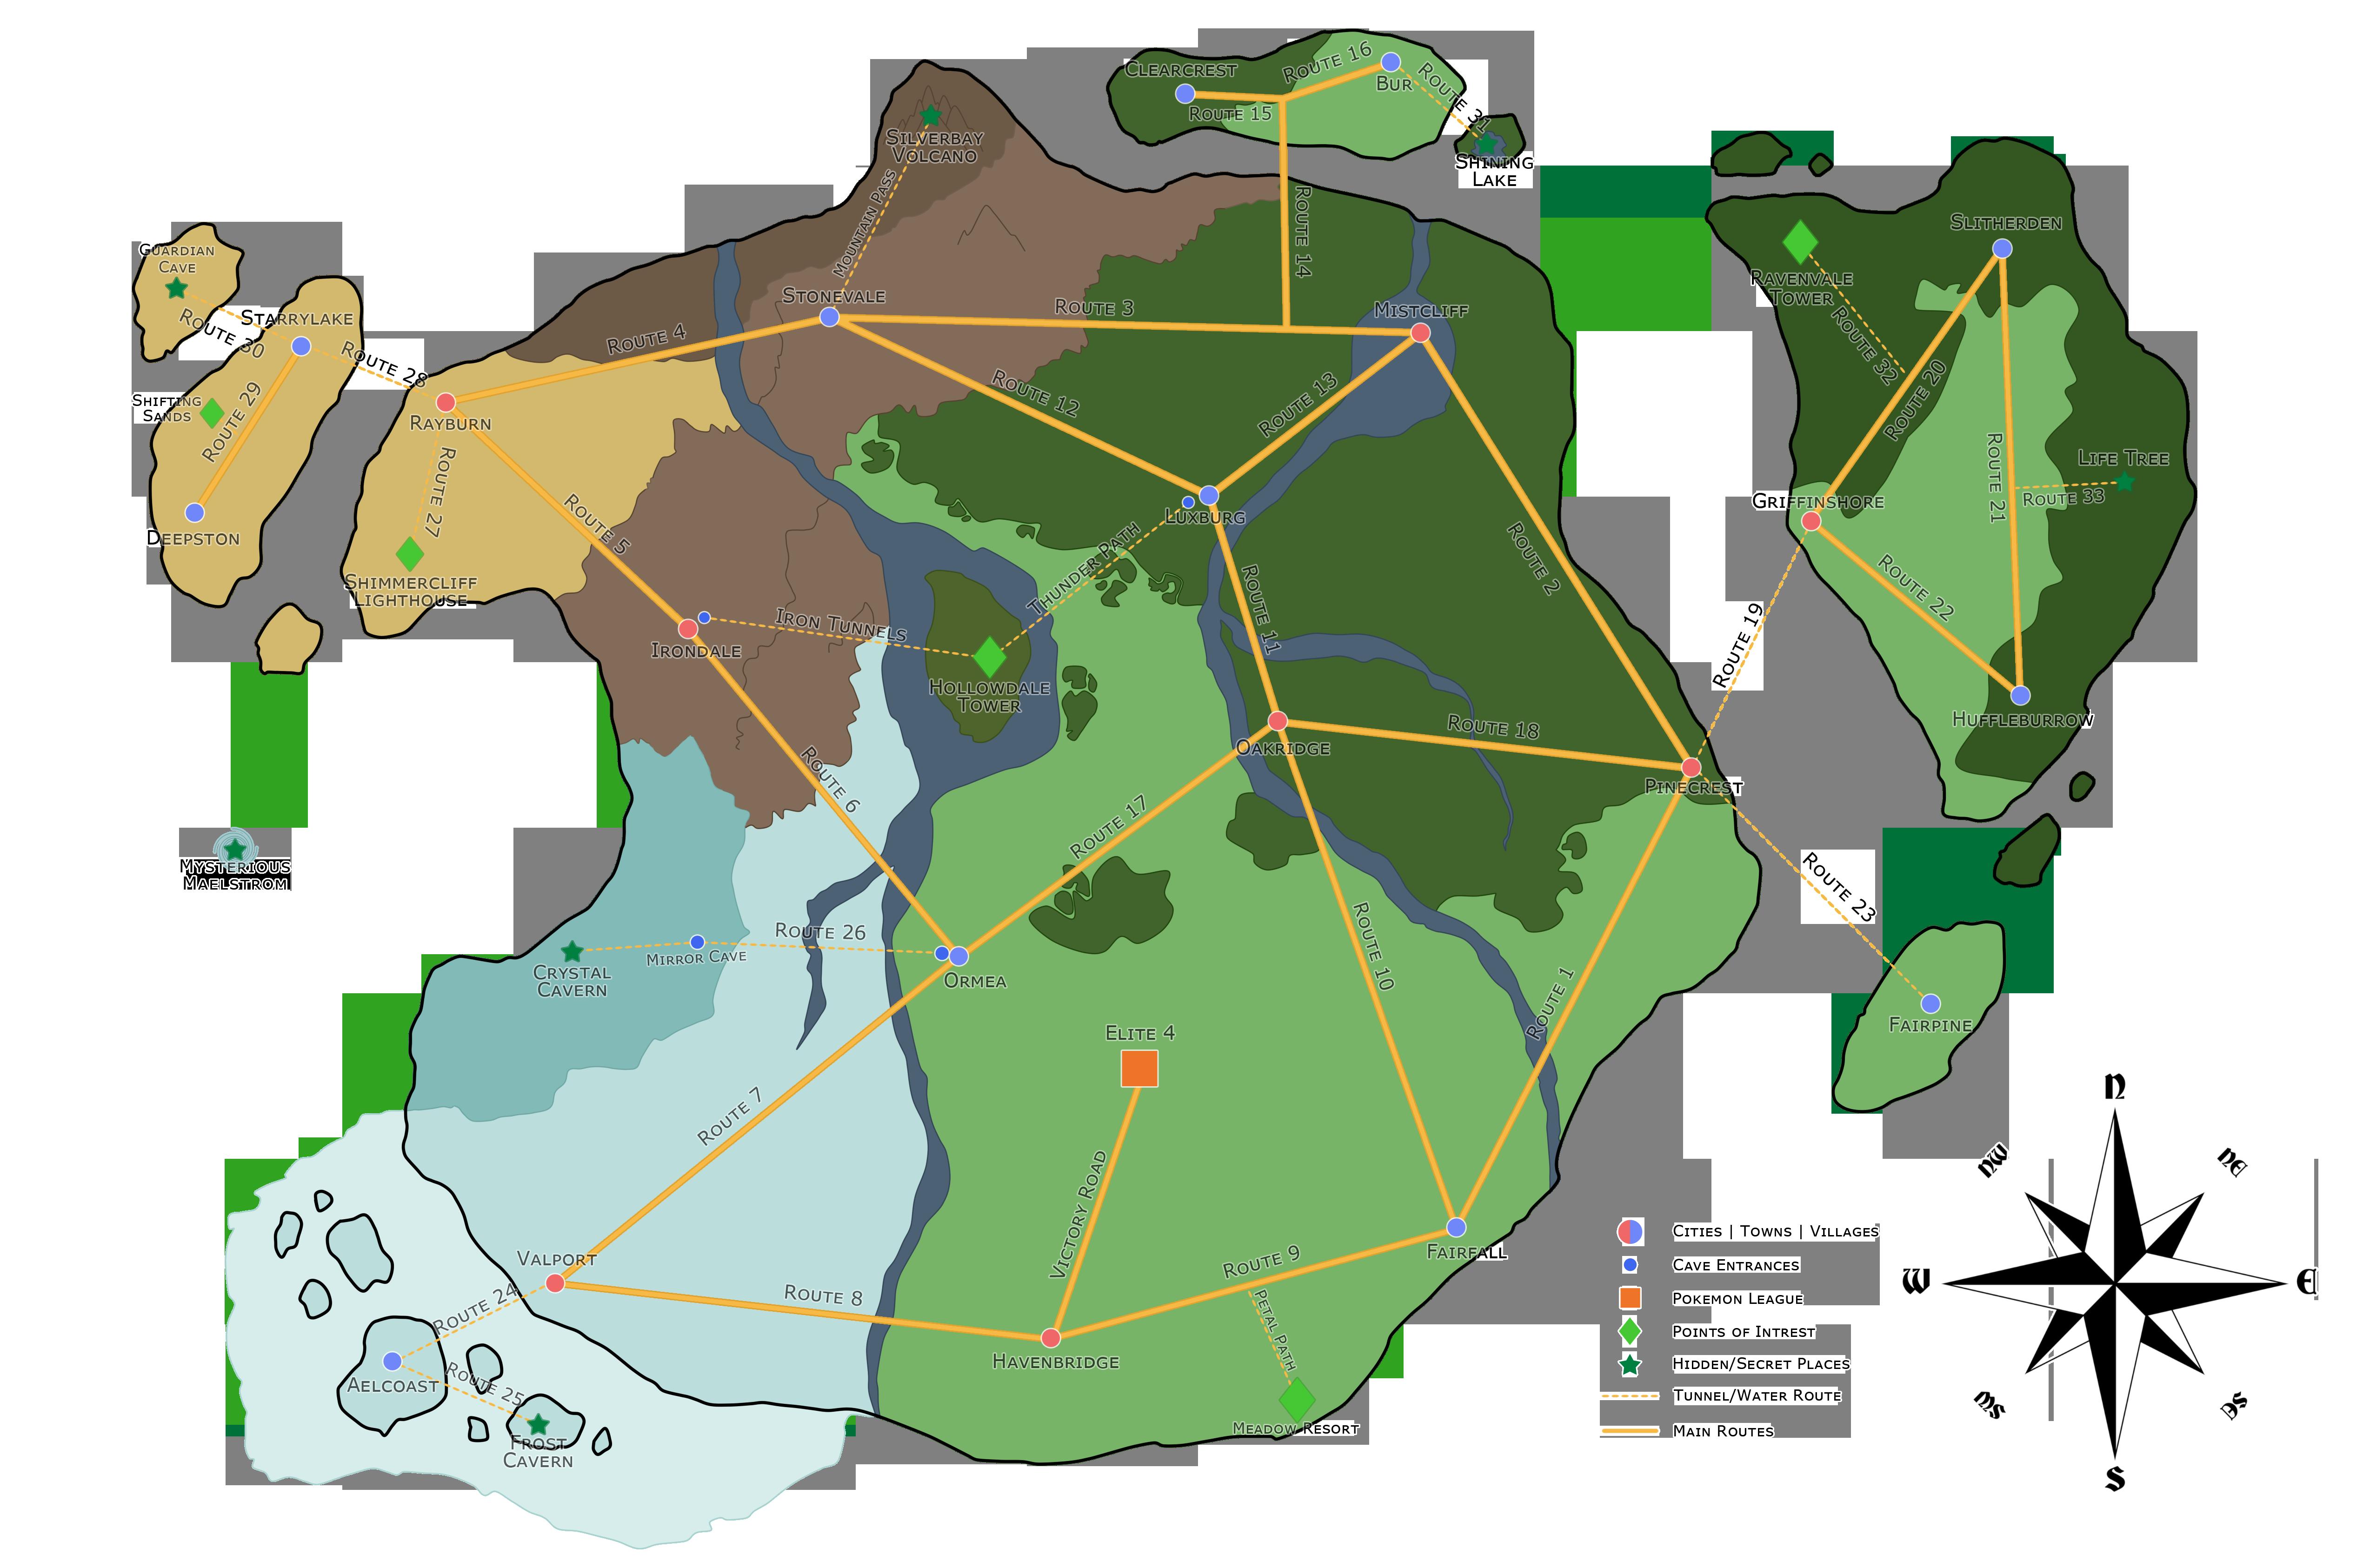 Map of the Sentou Region Sentou_region_map_by_port_metro-dafsdg2